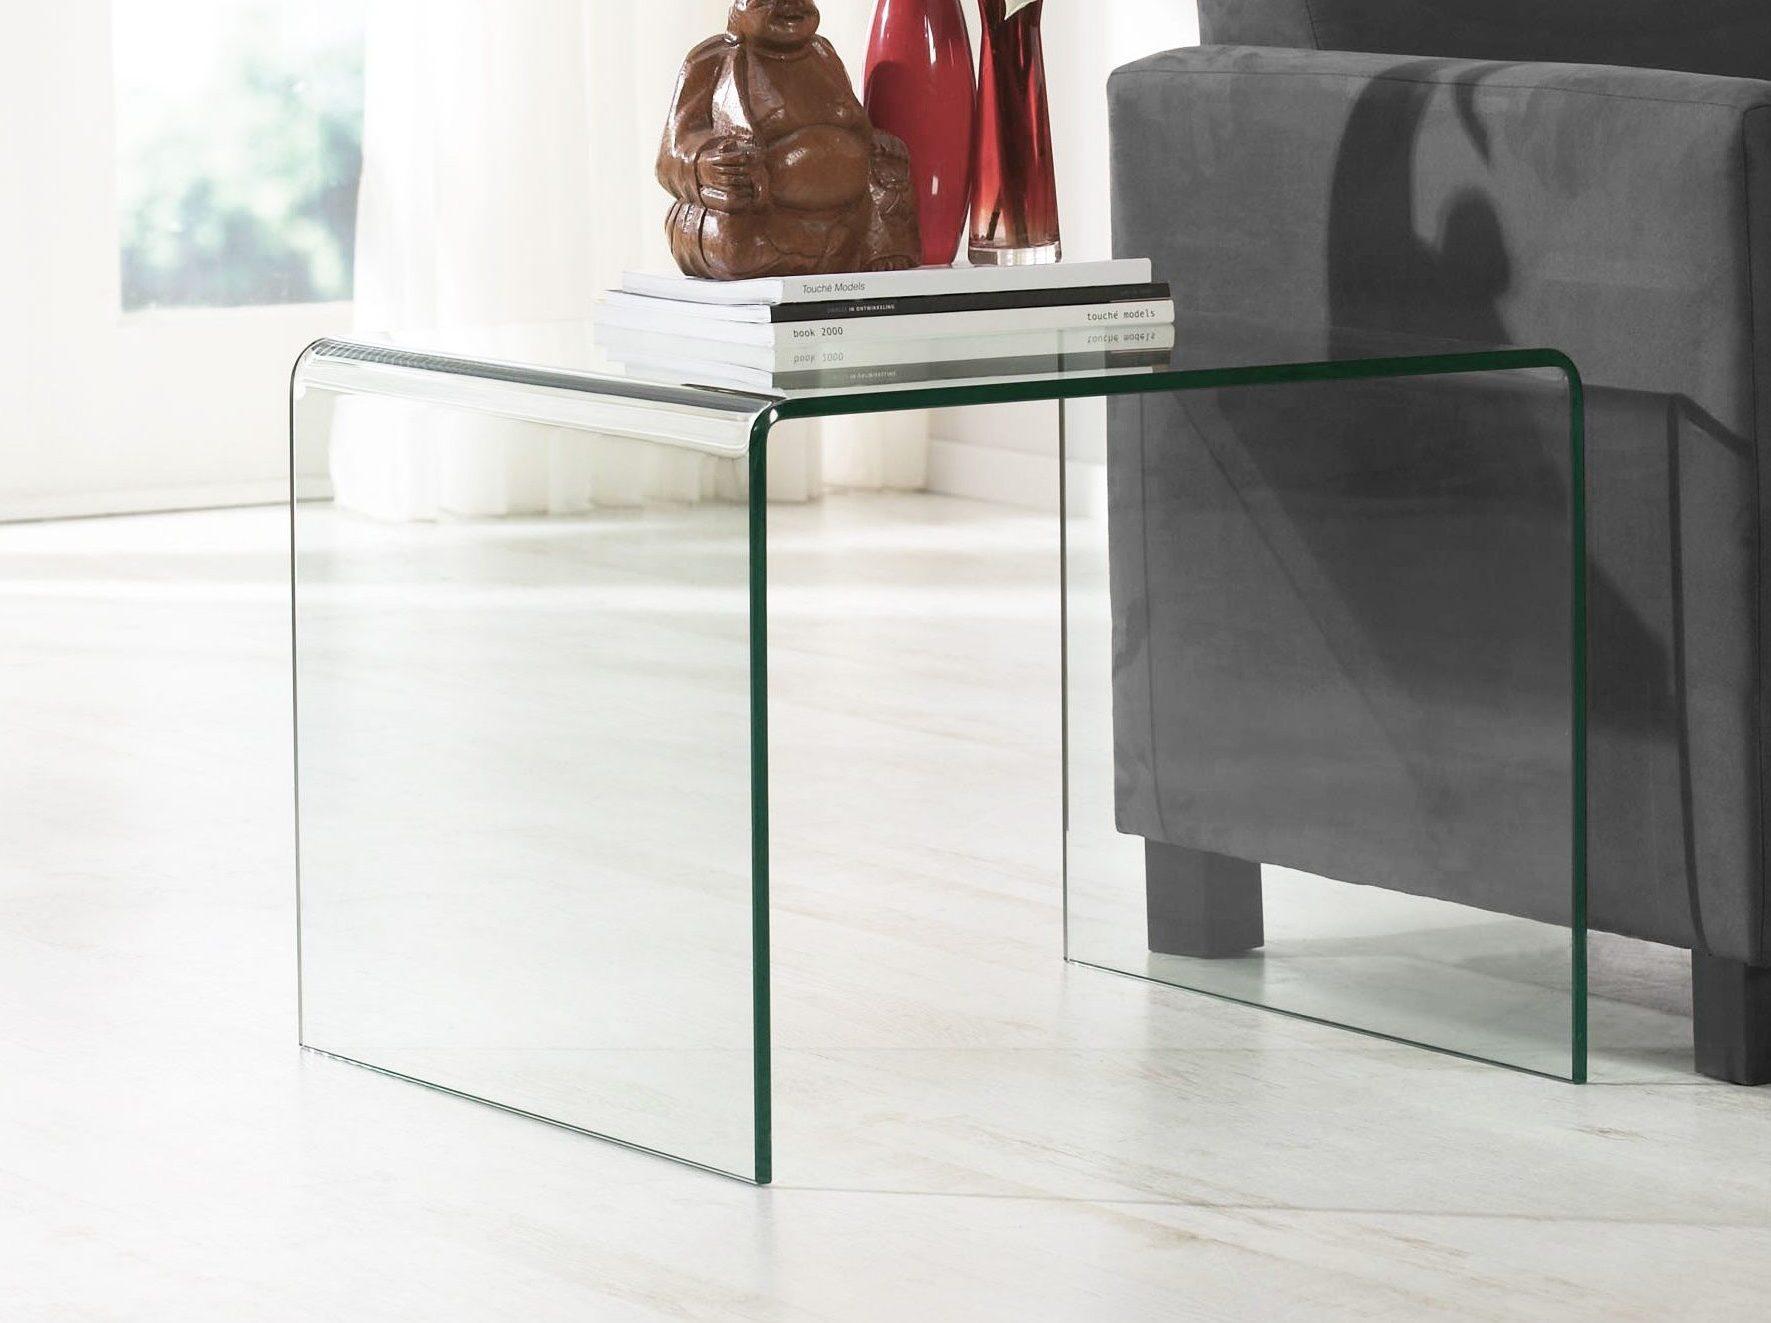 Glazen gebogen tafel set glazentafel.com